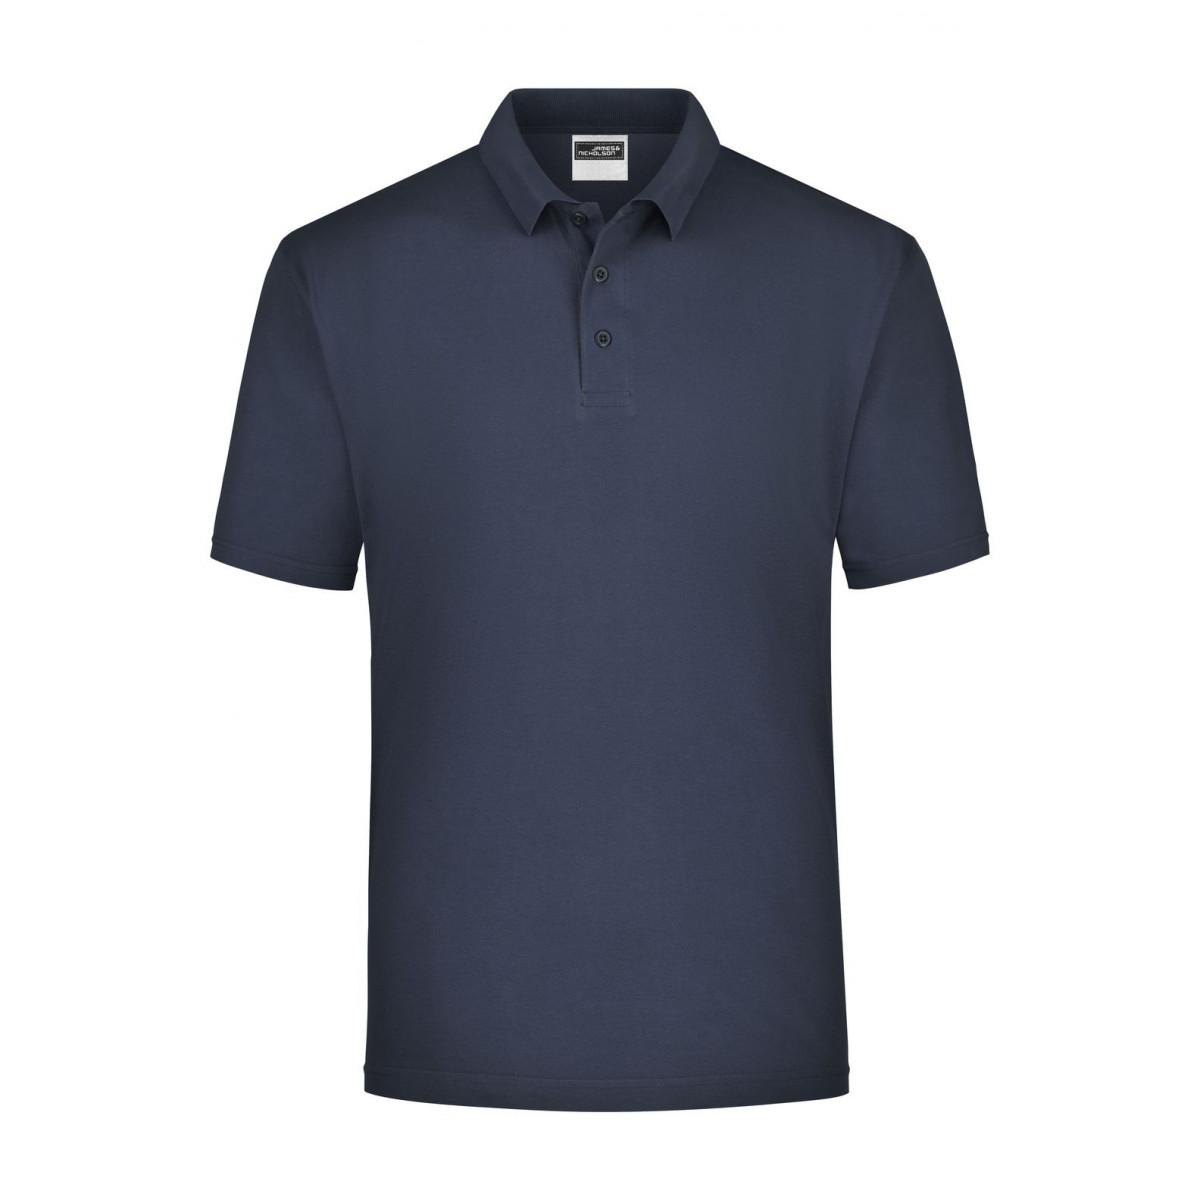 Рубашка поло мужская JN021 Polo Piqué Heavy - Темно-синий